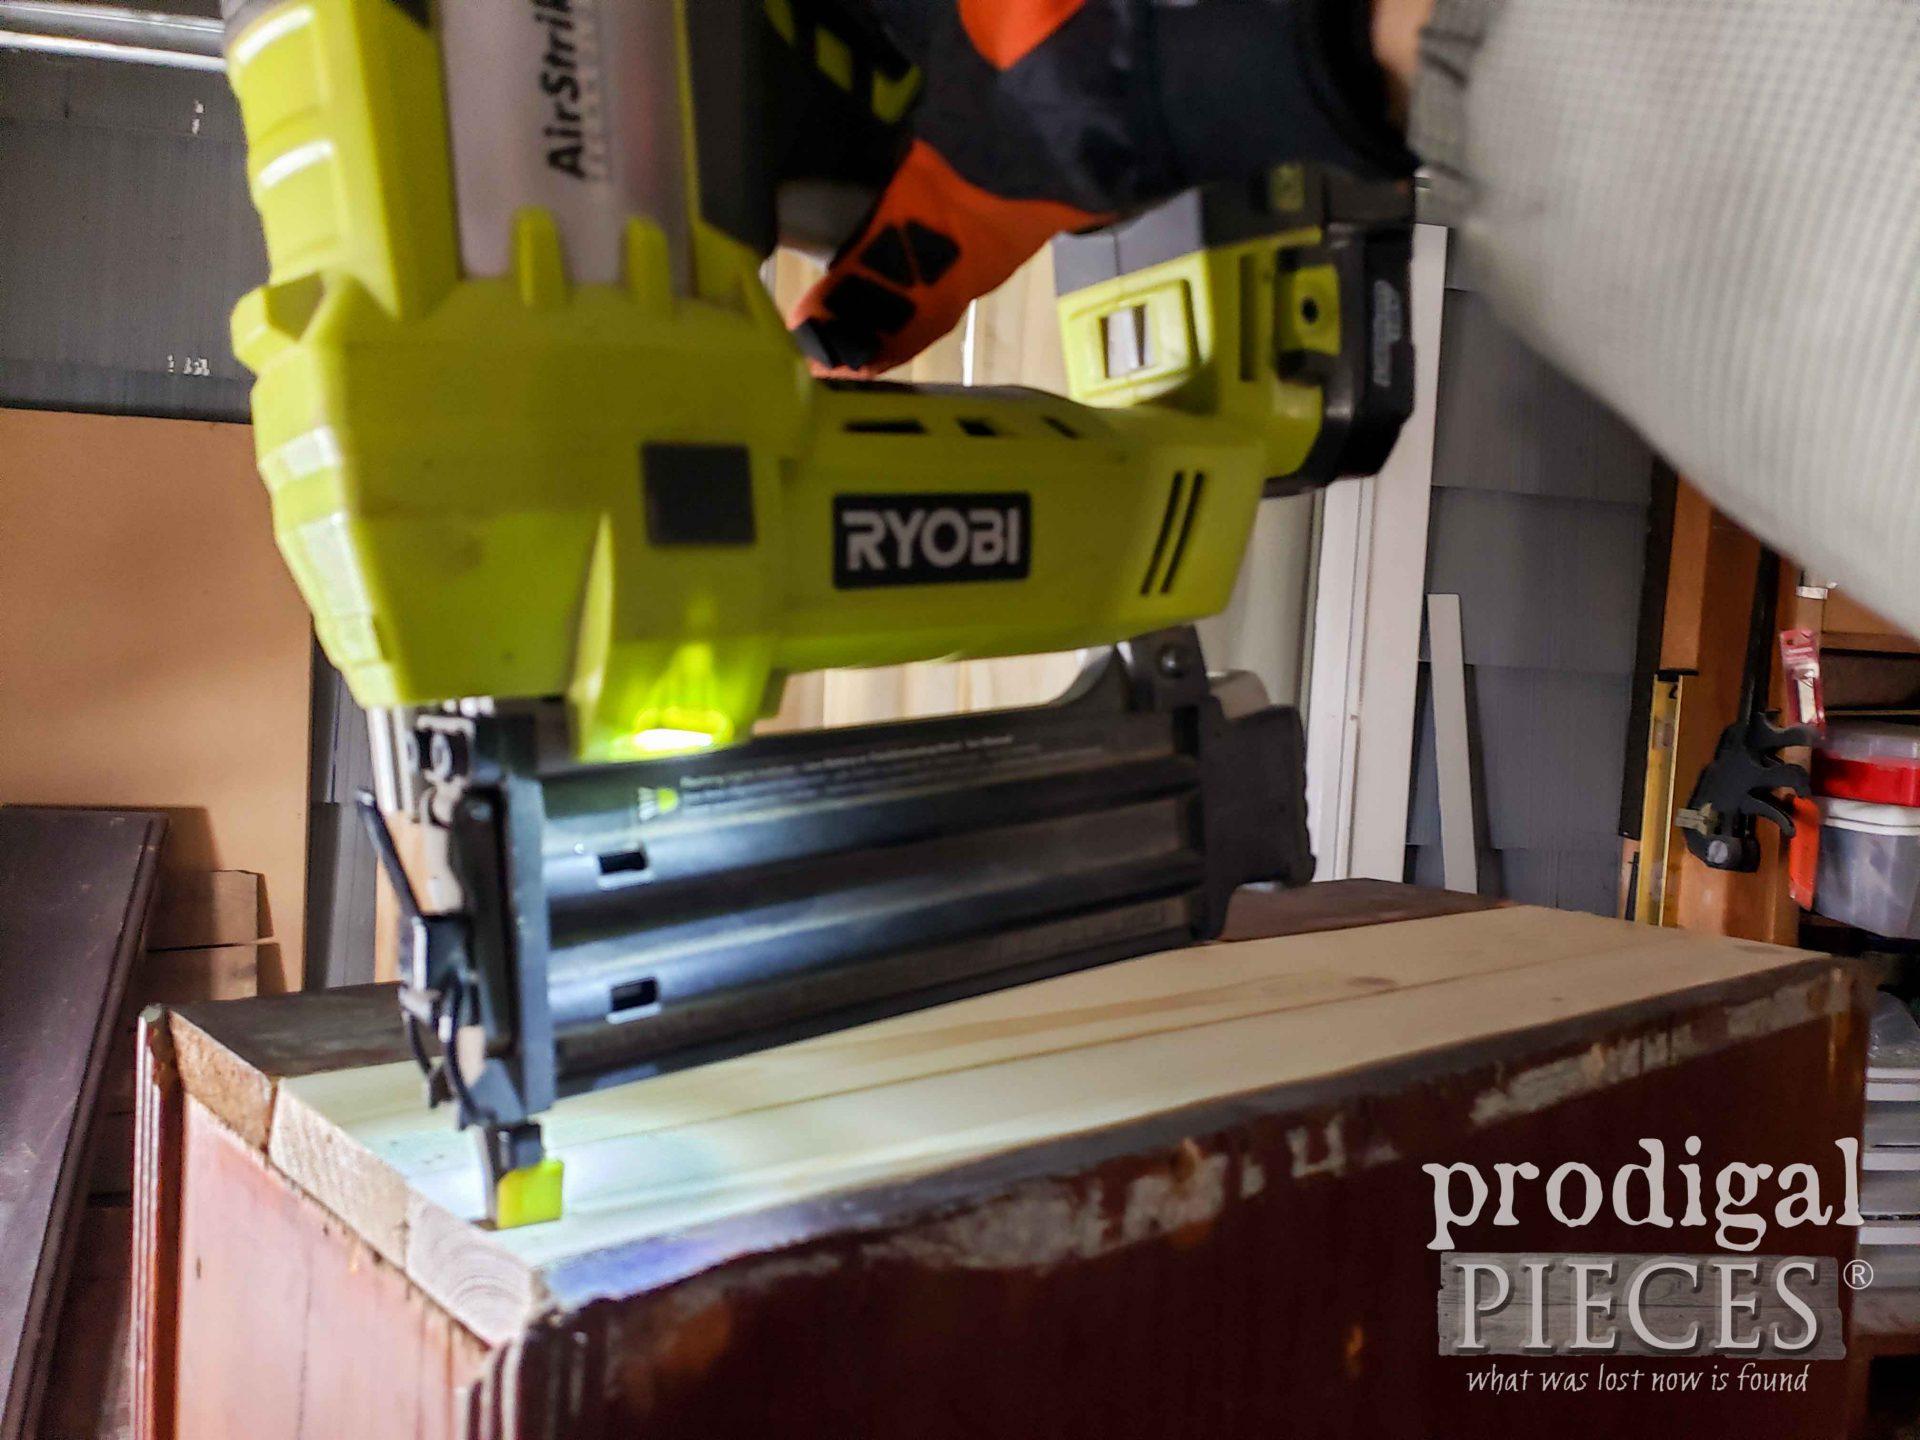 Nailing Wood Cabinet with Ryobi Nailer | prodigalpieces.com